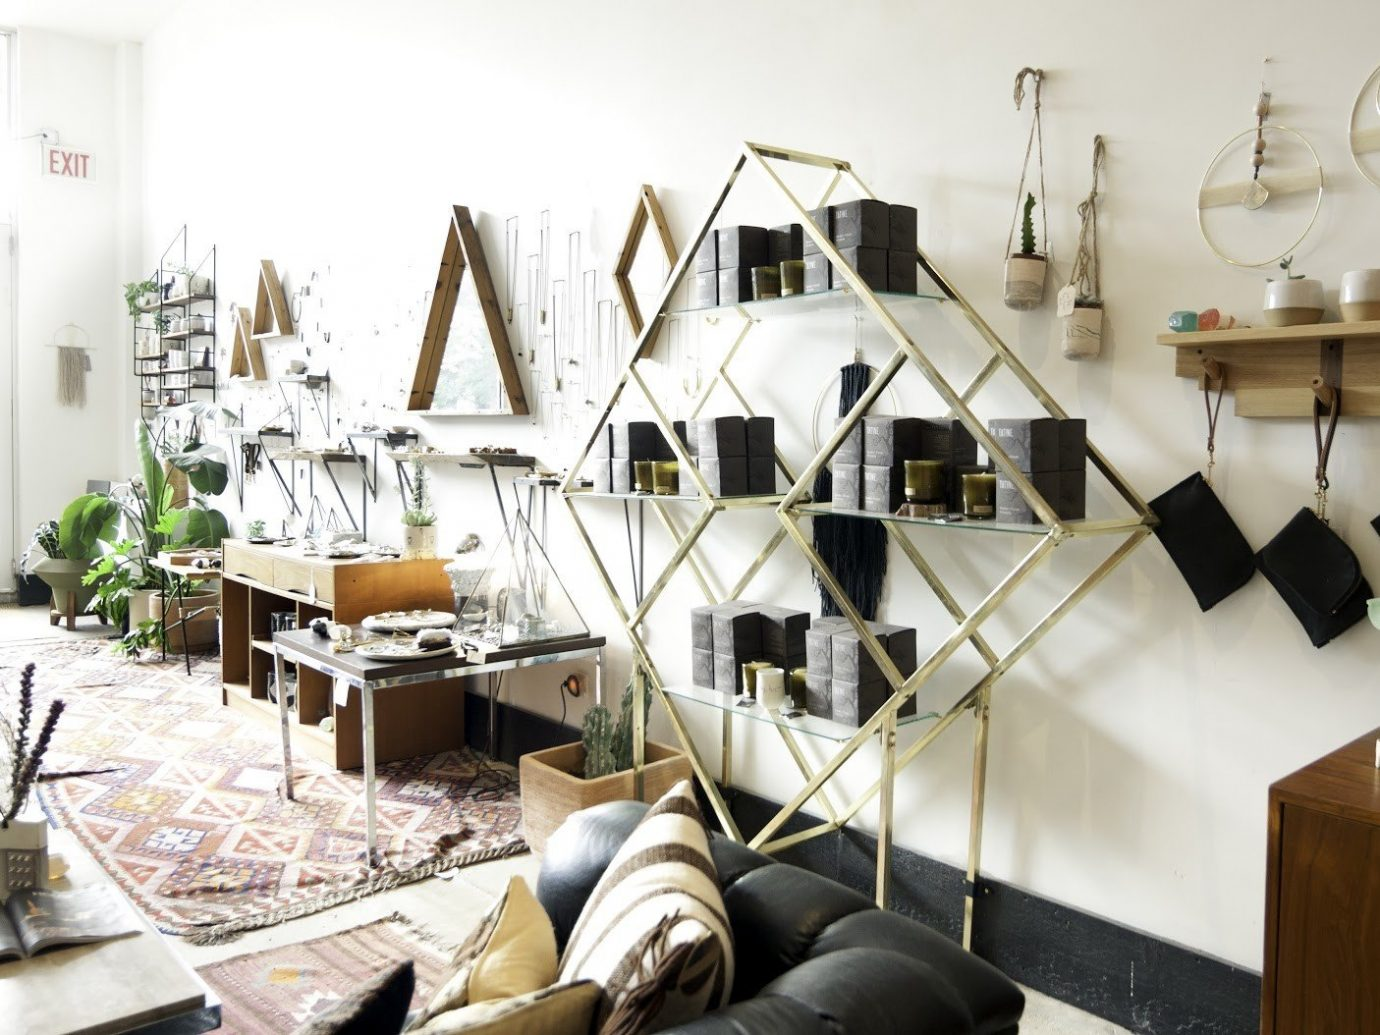 Trip Ideas indoor room Living living room home art interior design dining room Design furniture Boutique